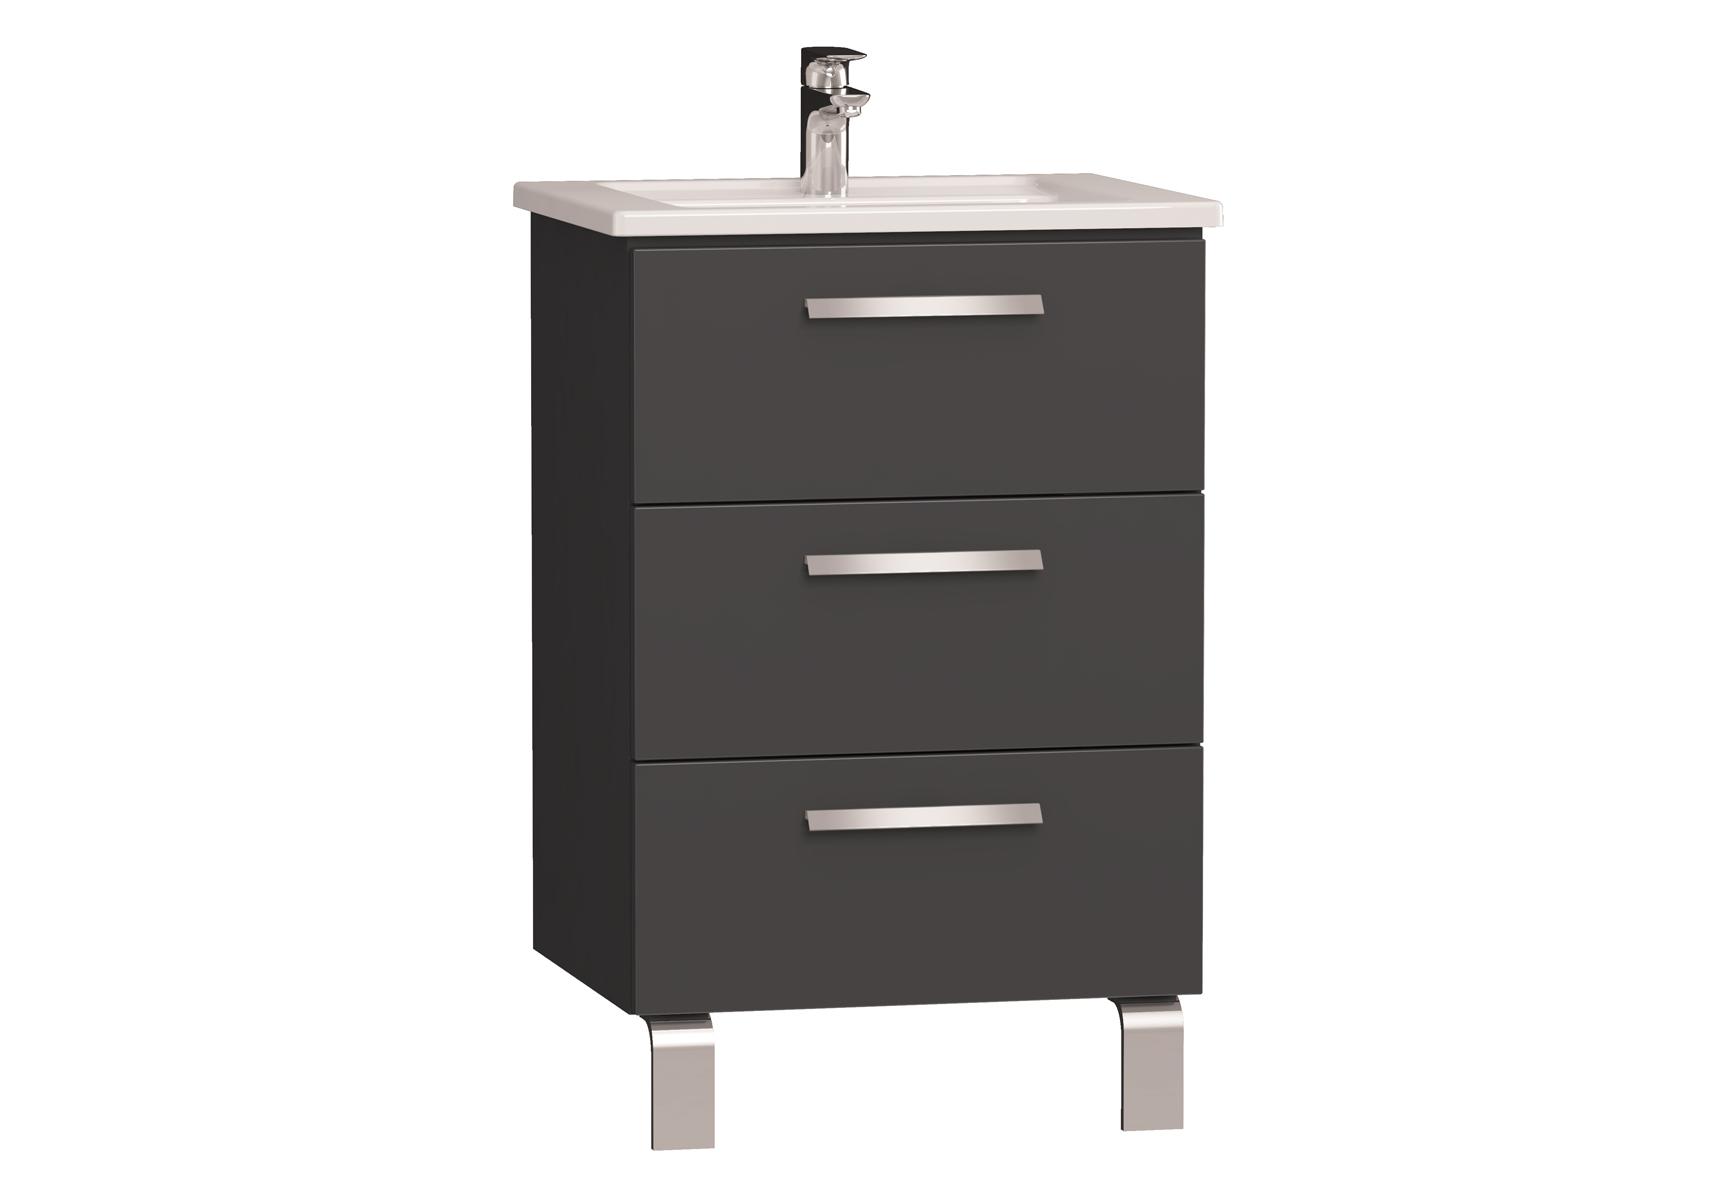 Integra meuble avec plan céramique avec trois tiroirs, 60 cm, anthraciteacite haute brillance